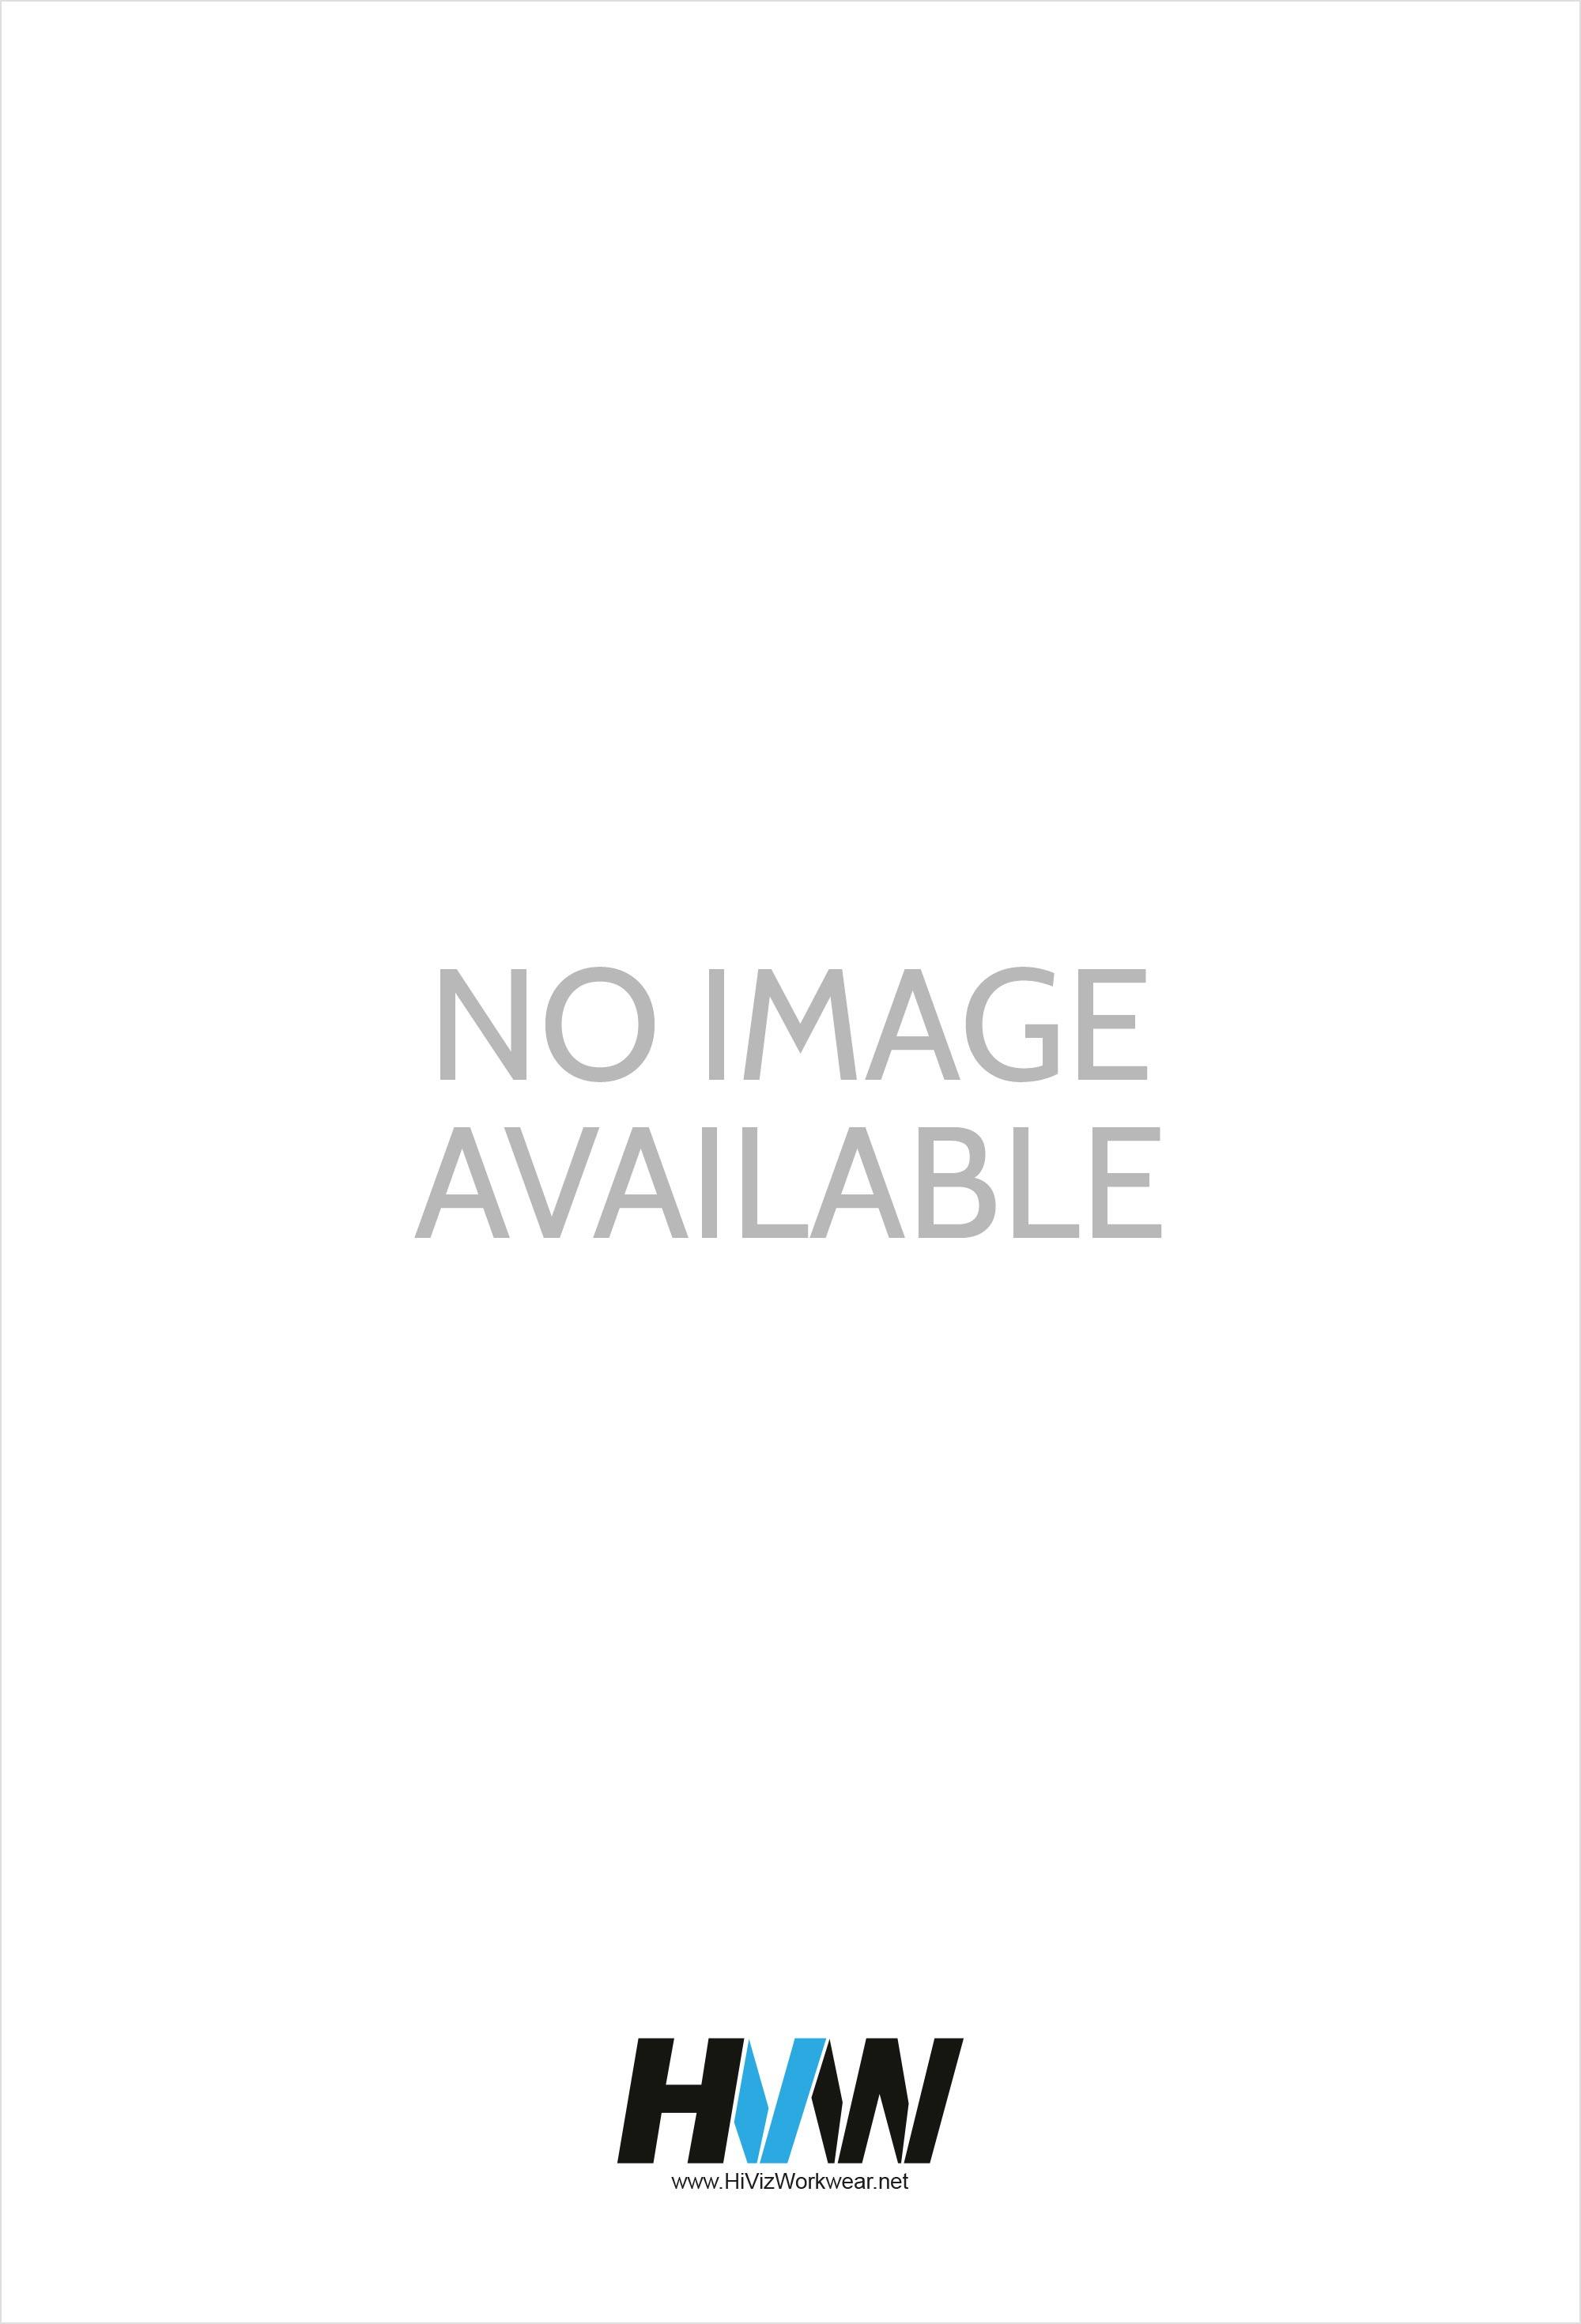 J262M Set-In-Sleeve Sweatshirt (XSmall to 3XLarge) 7 COLOURS